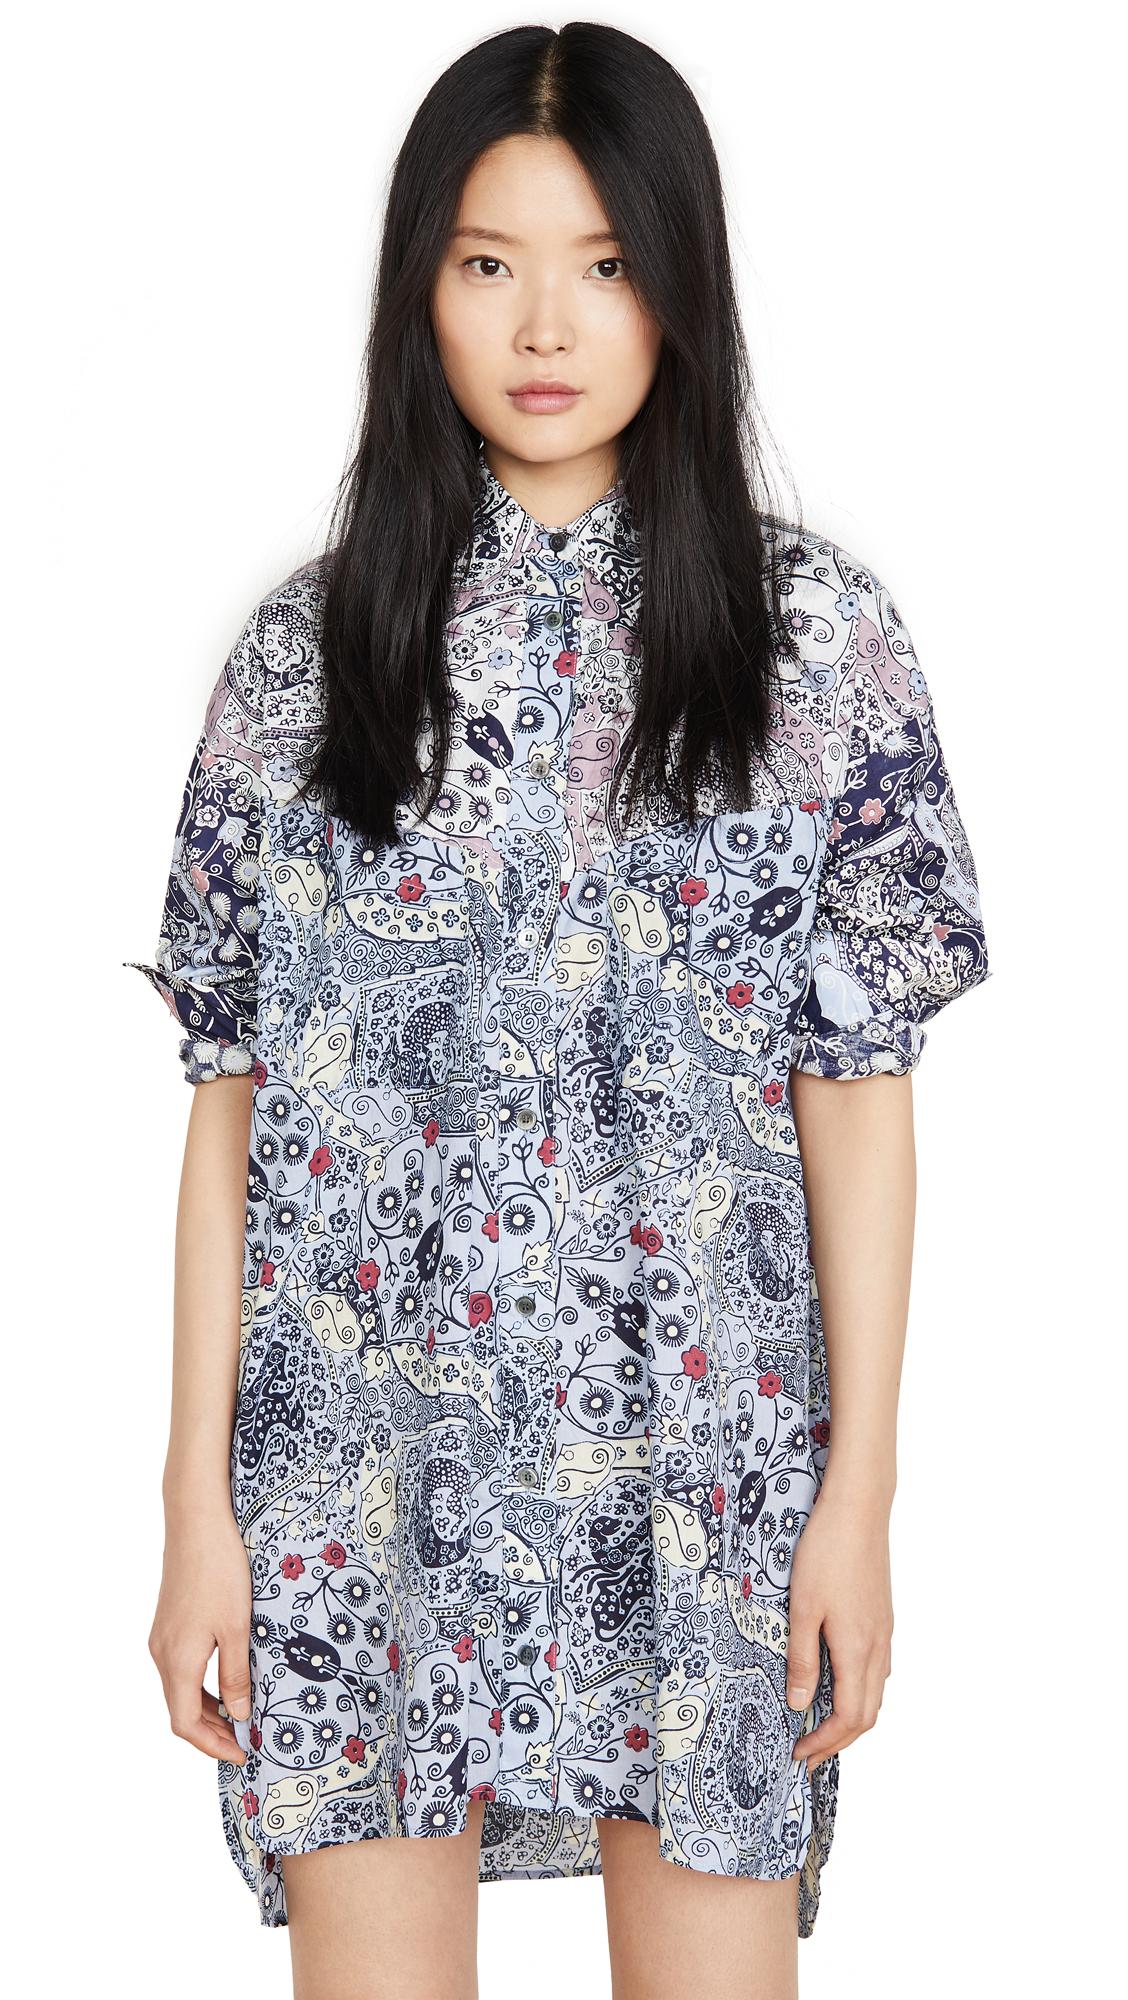 Isabel Marant Etoile Ussaya Dress - 45% Off Sale